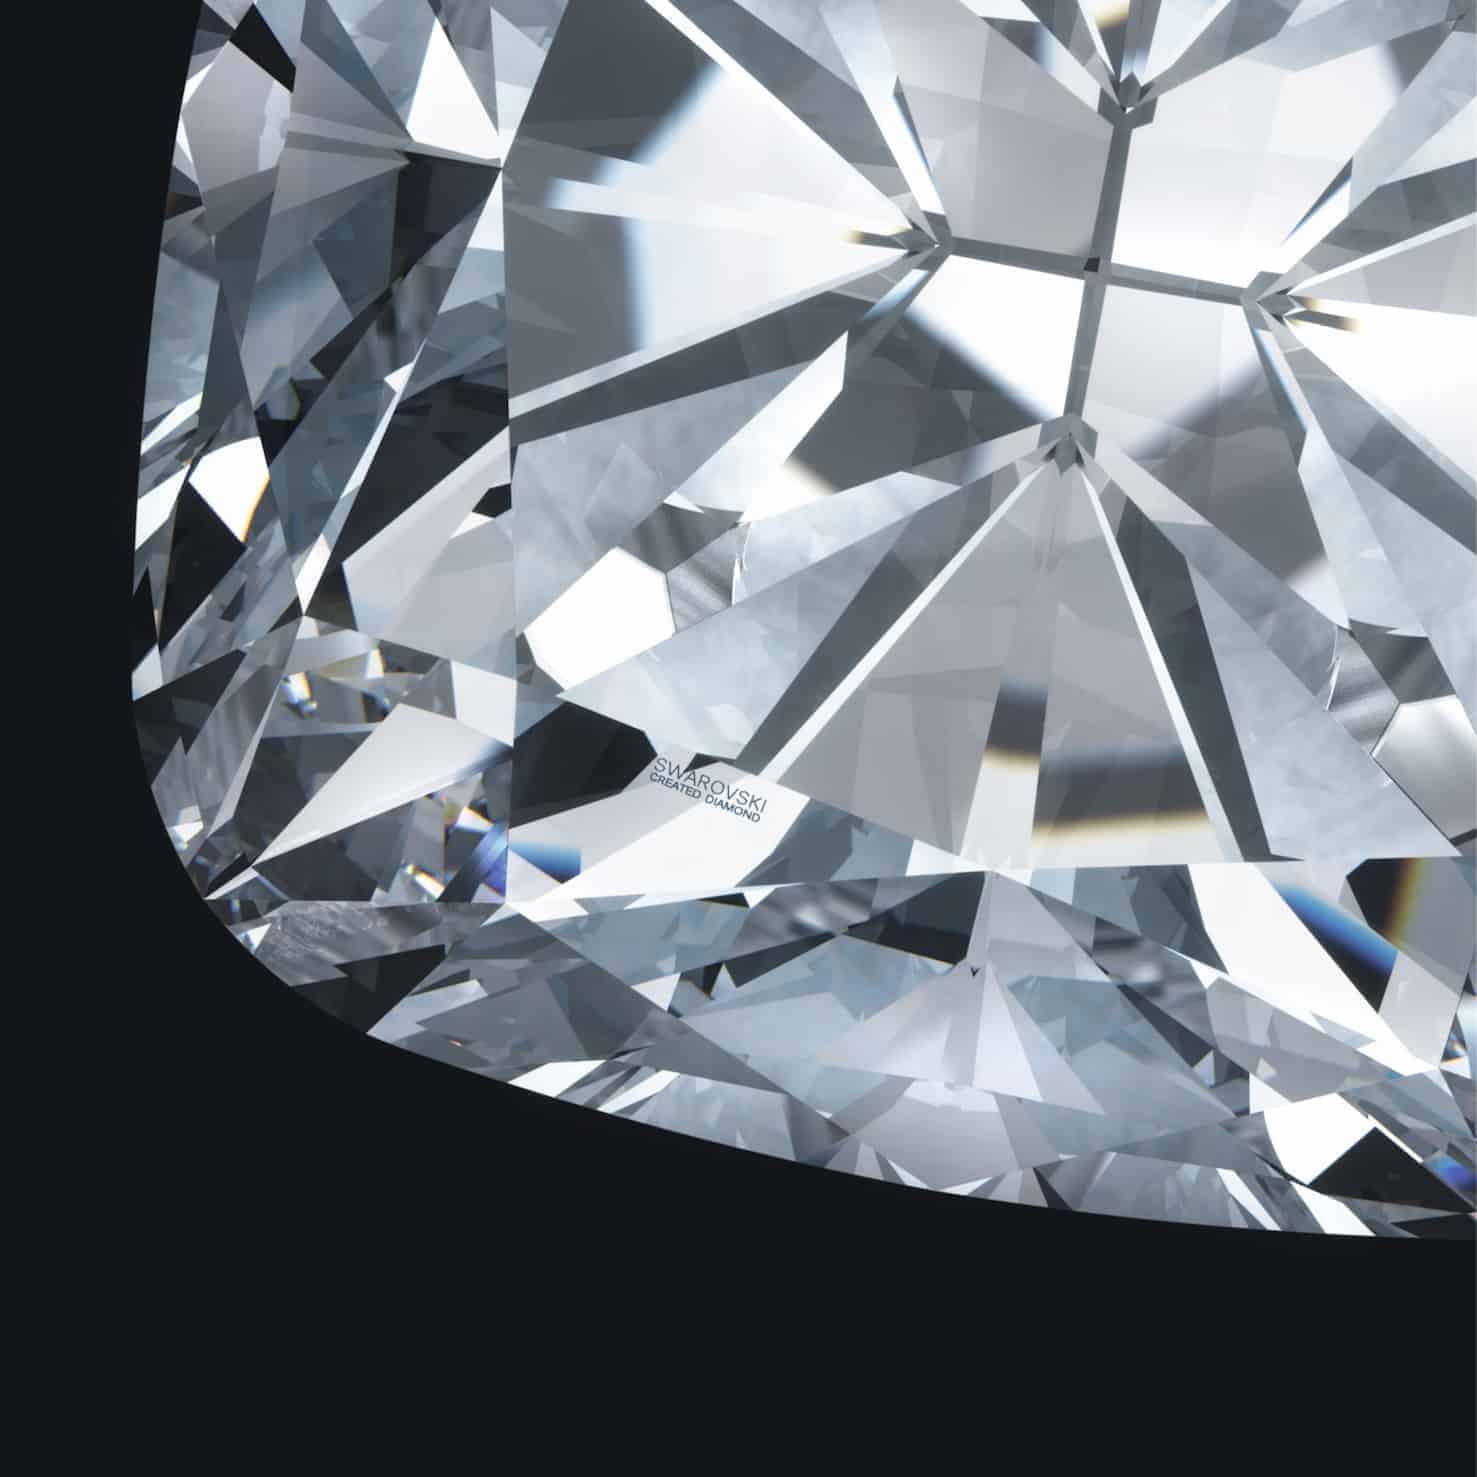 Swarovski Webinar on Lab Grown Diamond Story and Opportunity